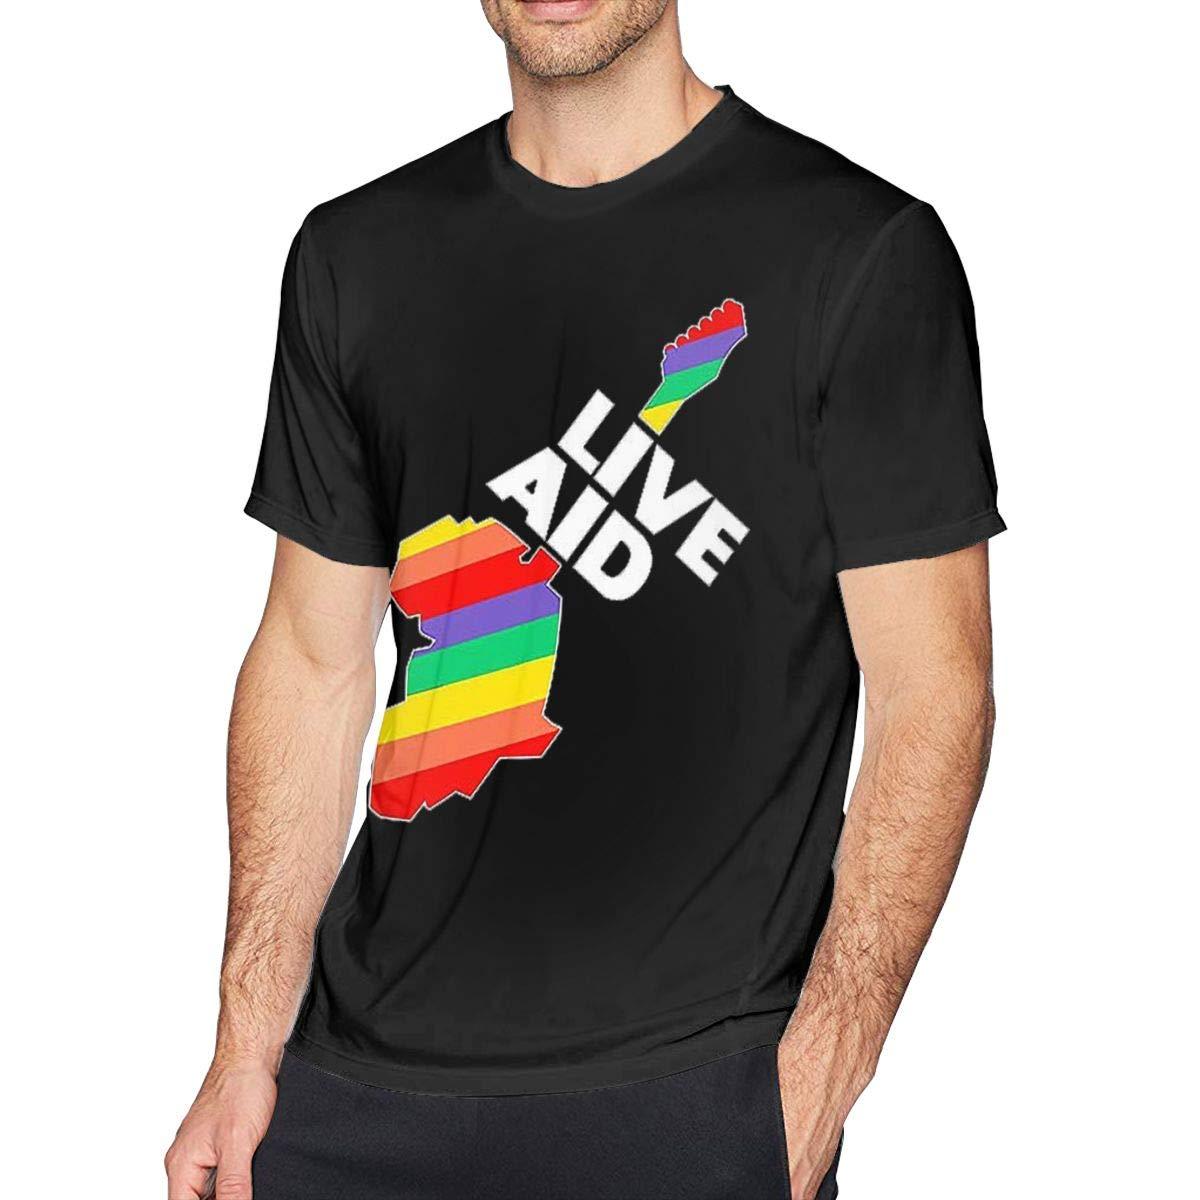 Apfdkqdgadc Live Aid Band Beautiful Shirt